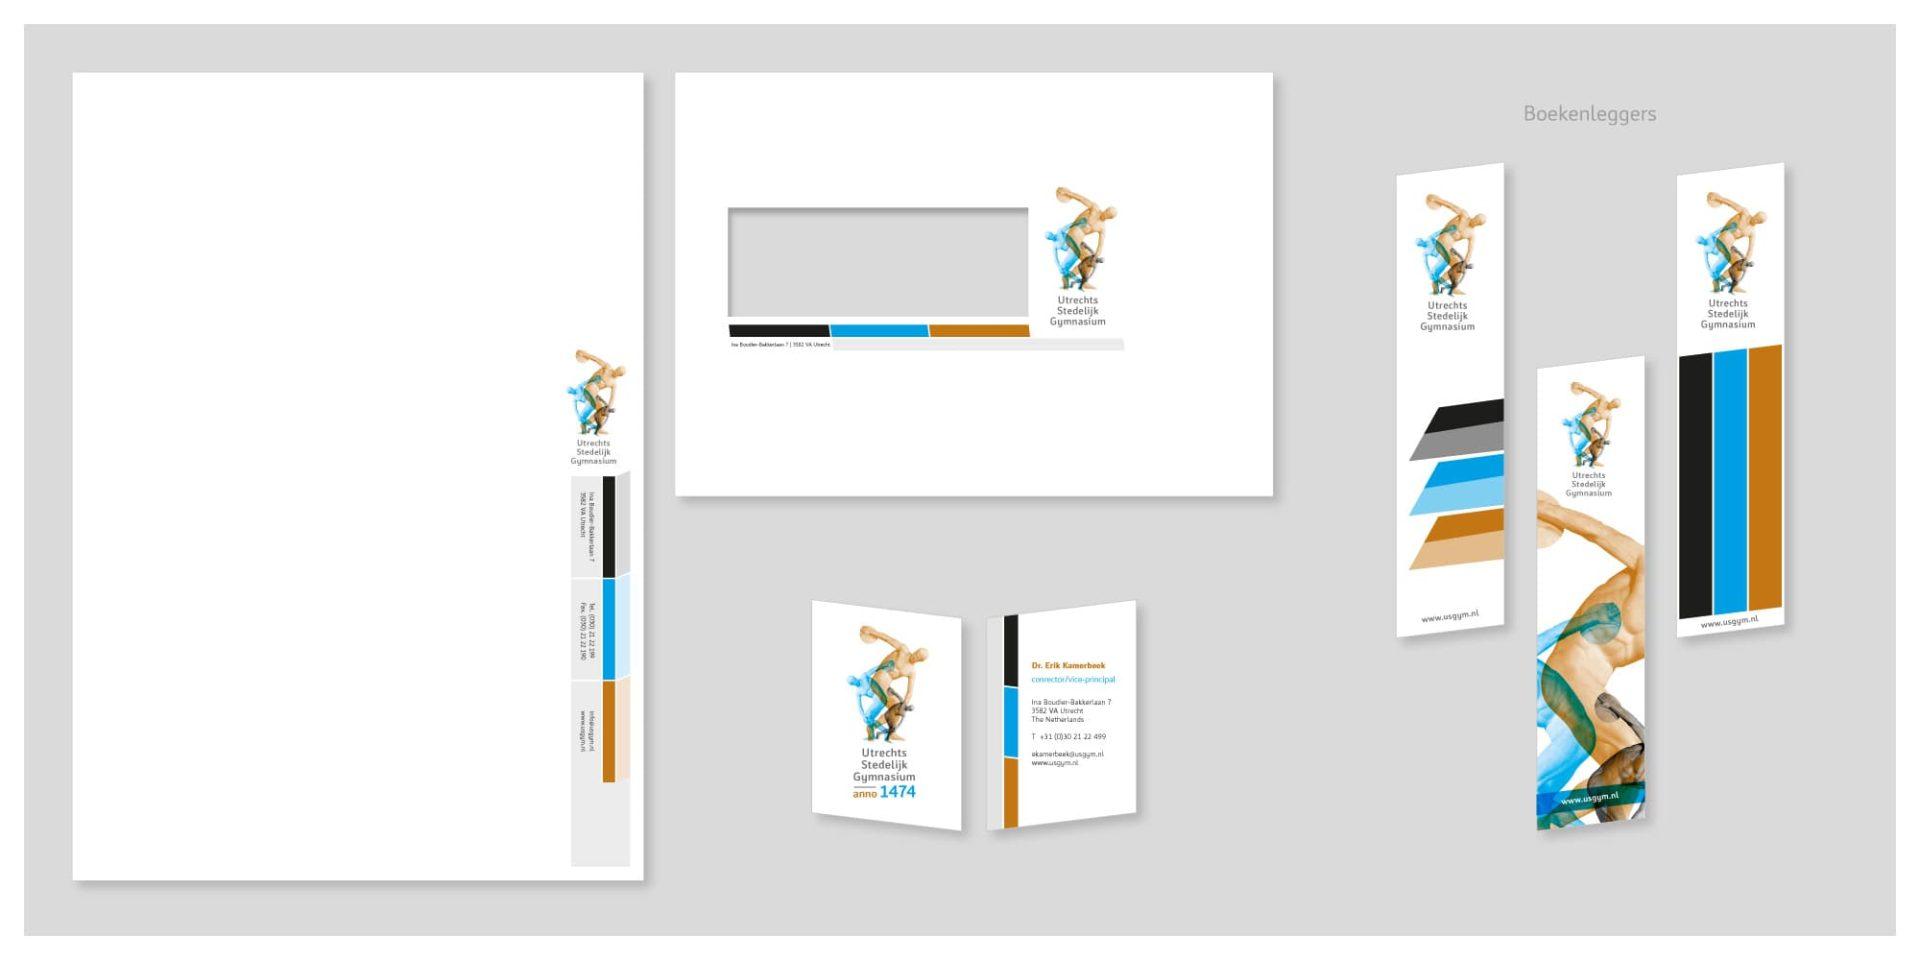 USG huisstijl management design system - Jeroen Borrenbergs)